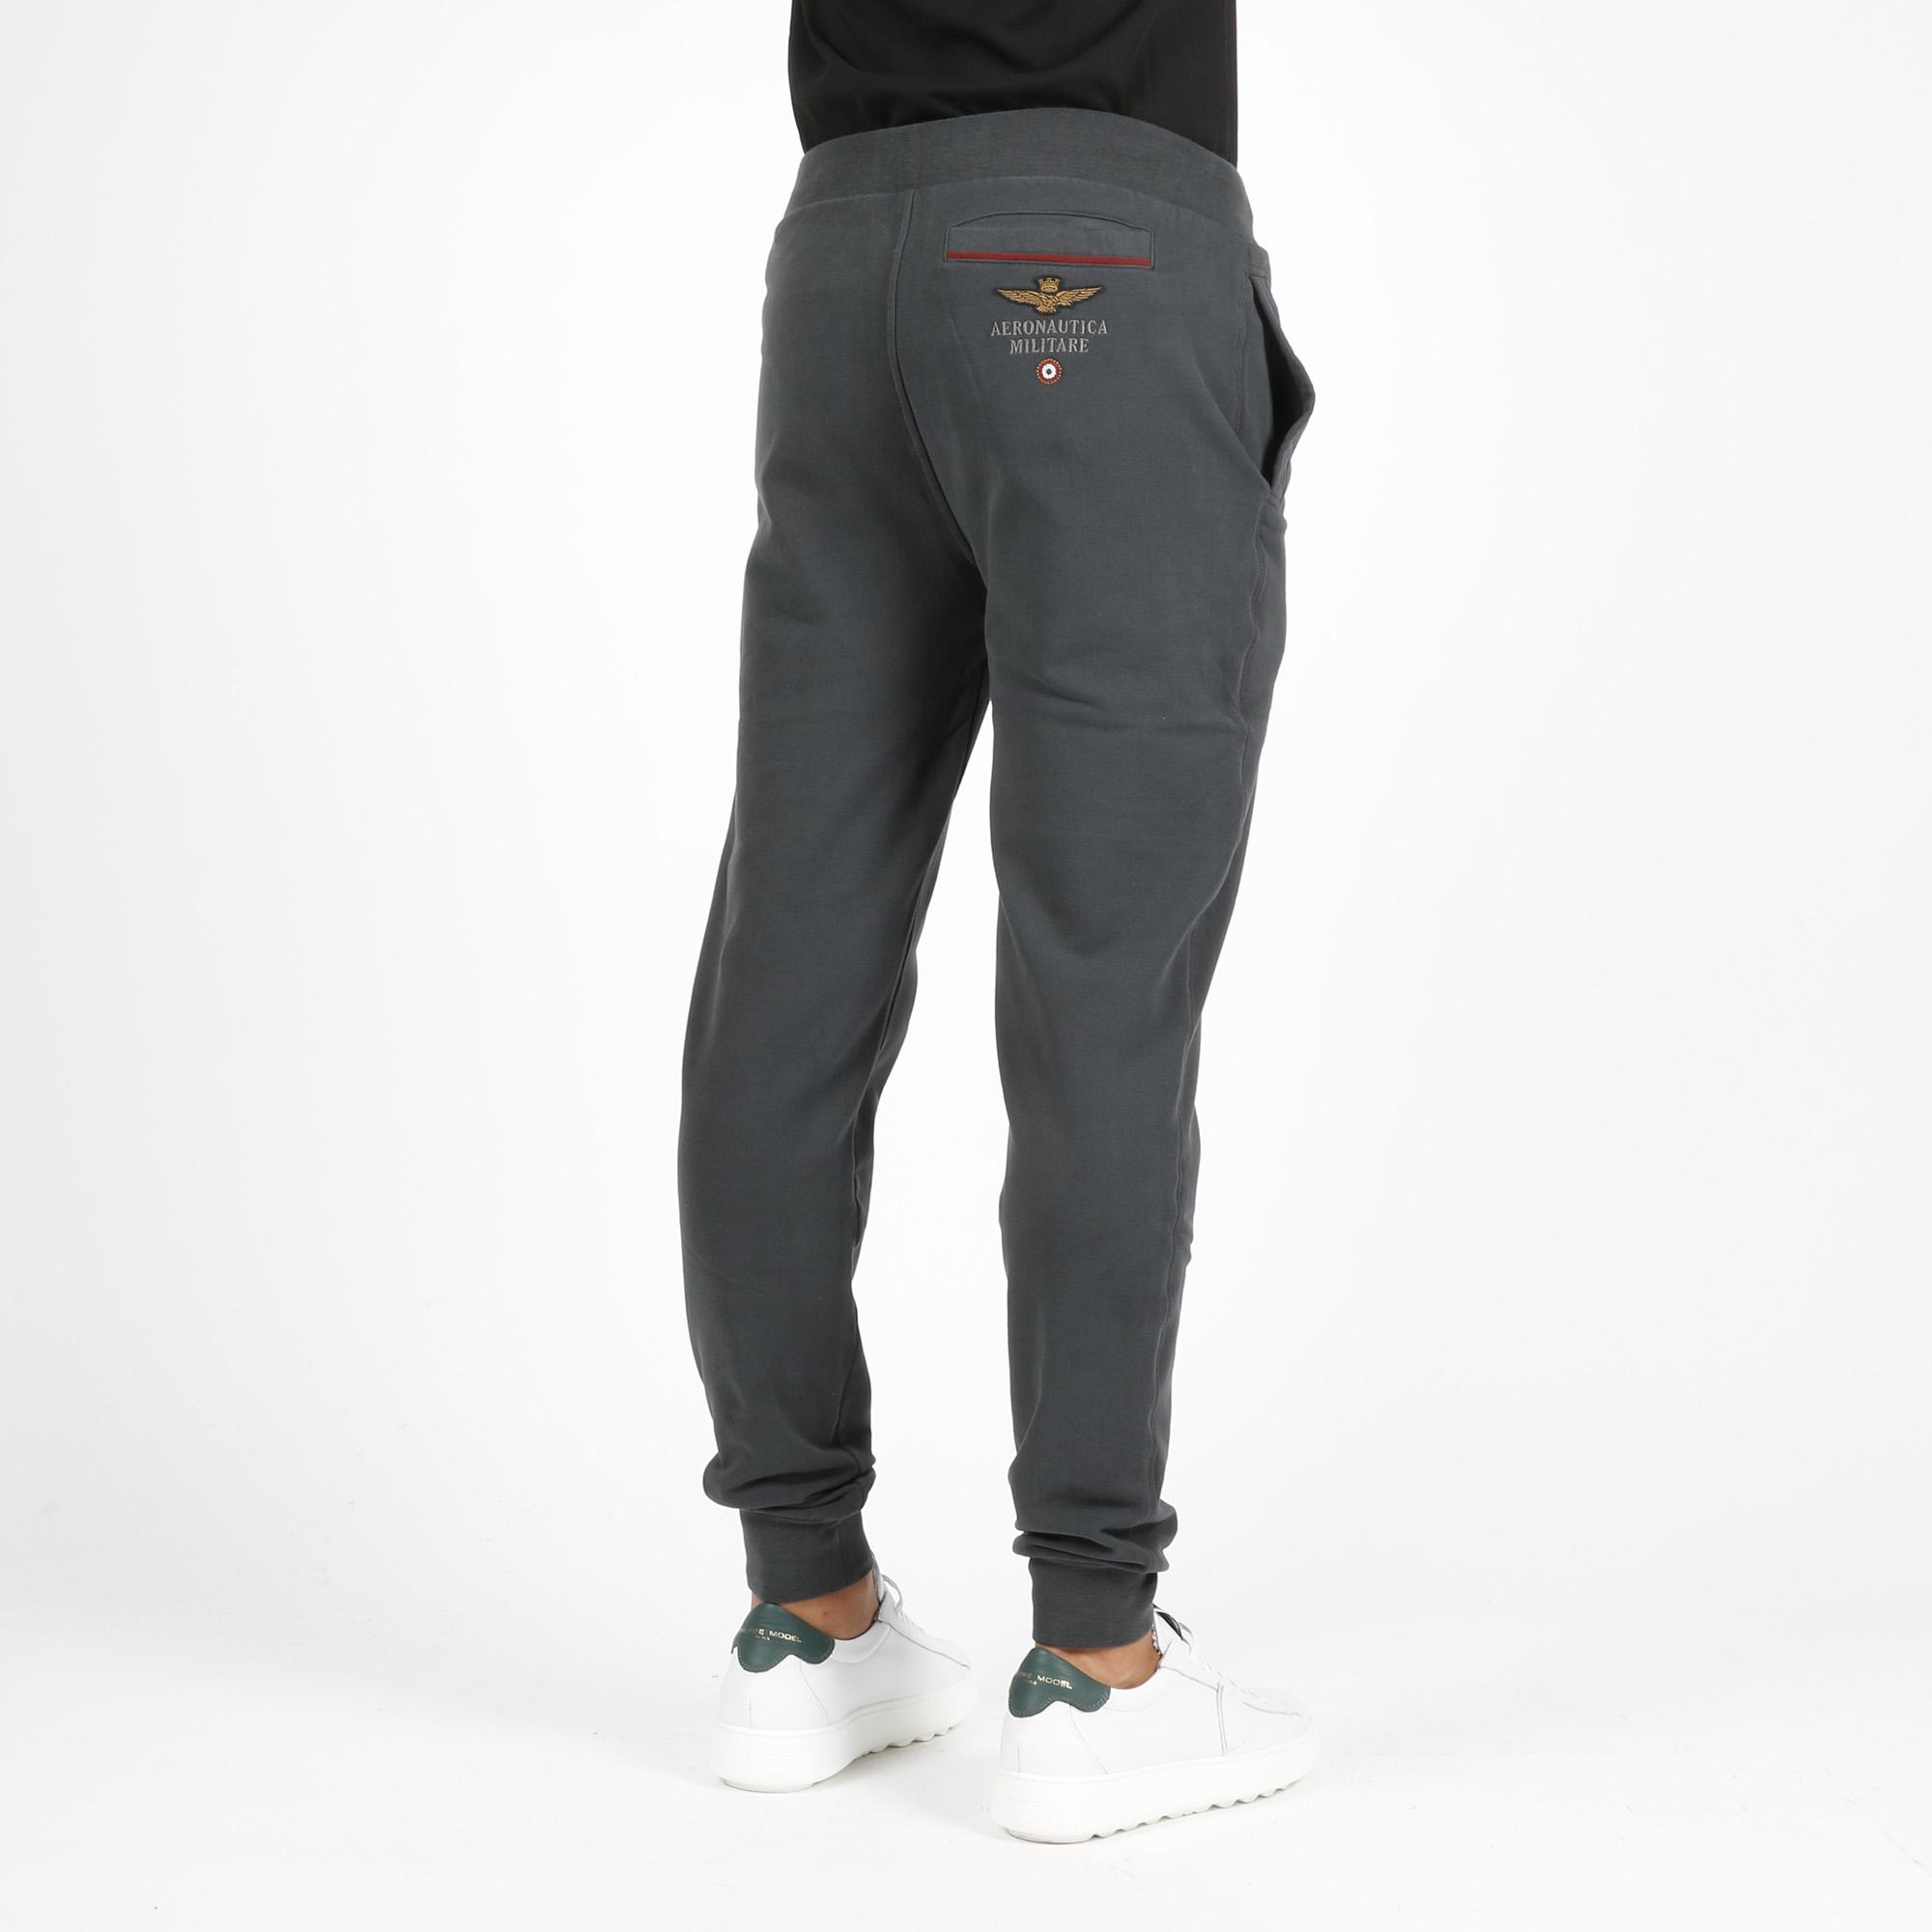 Pantalone tuta logo - Asfalto